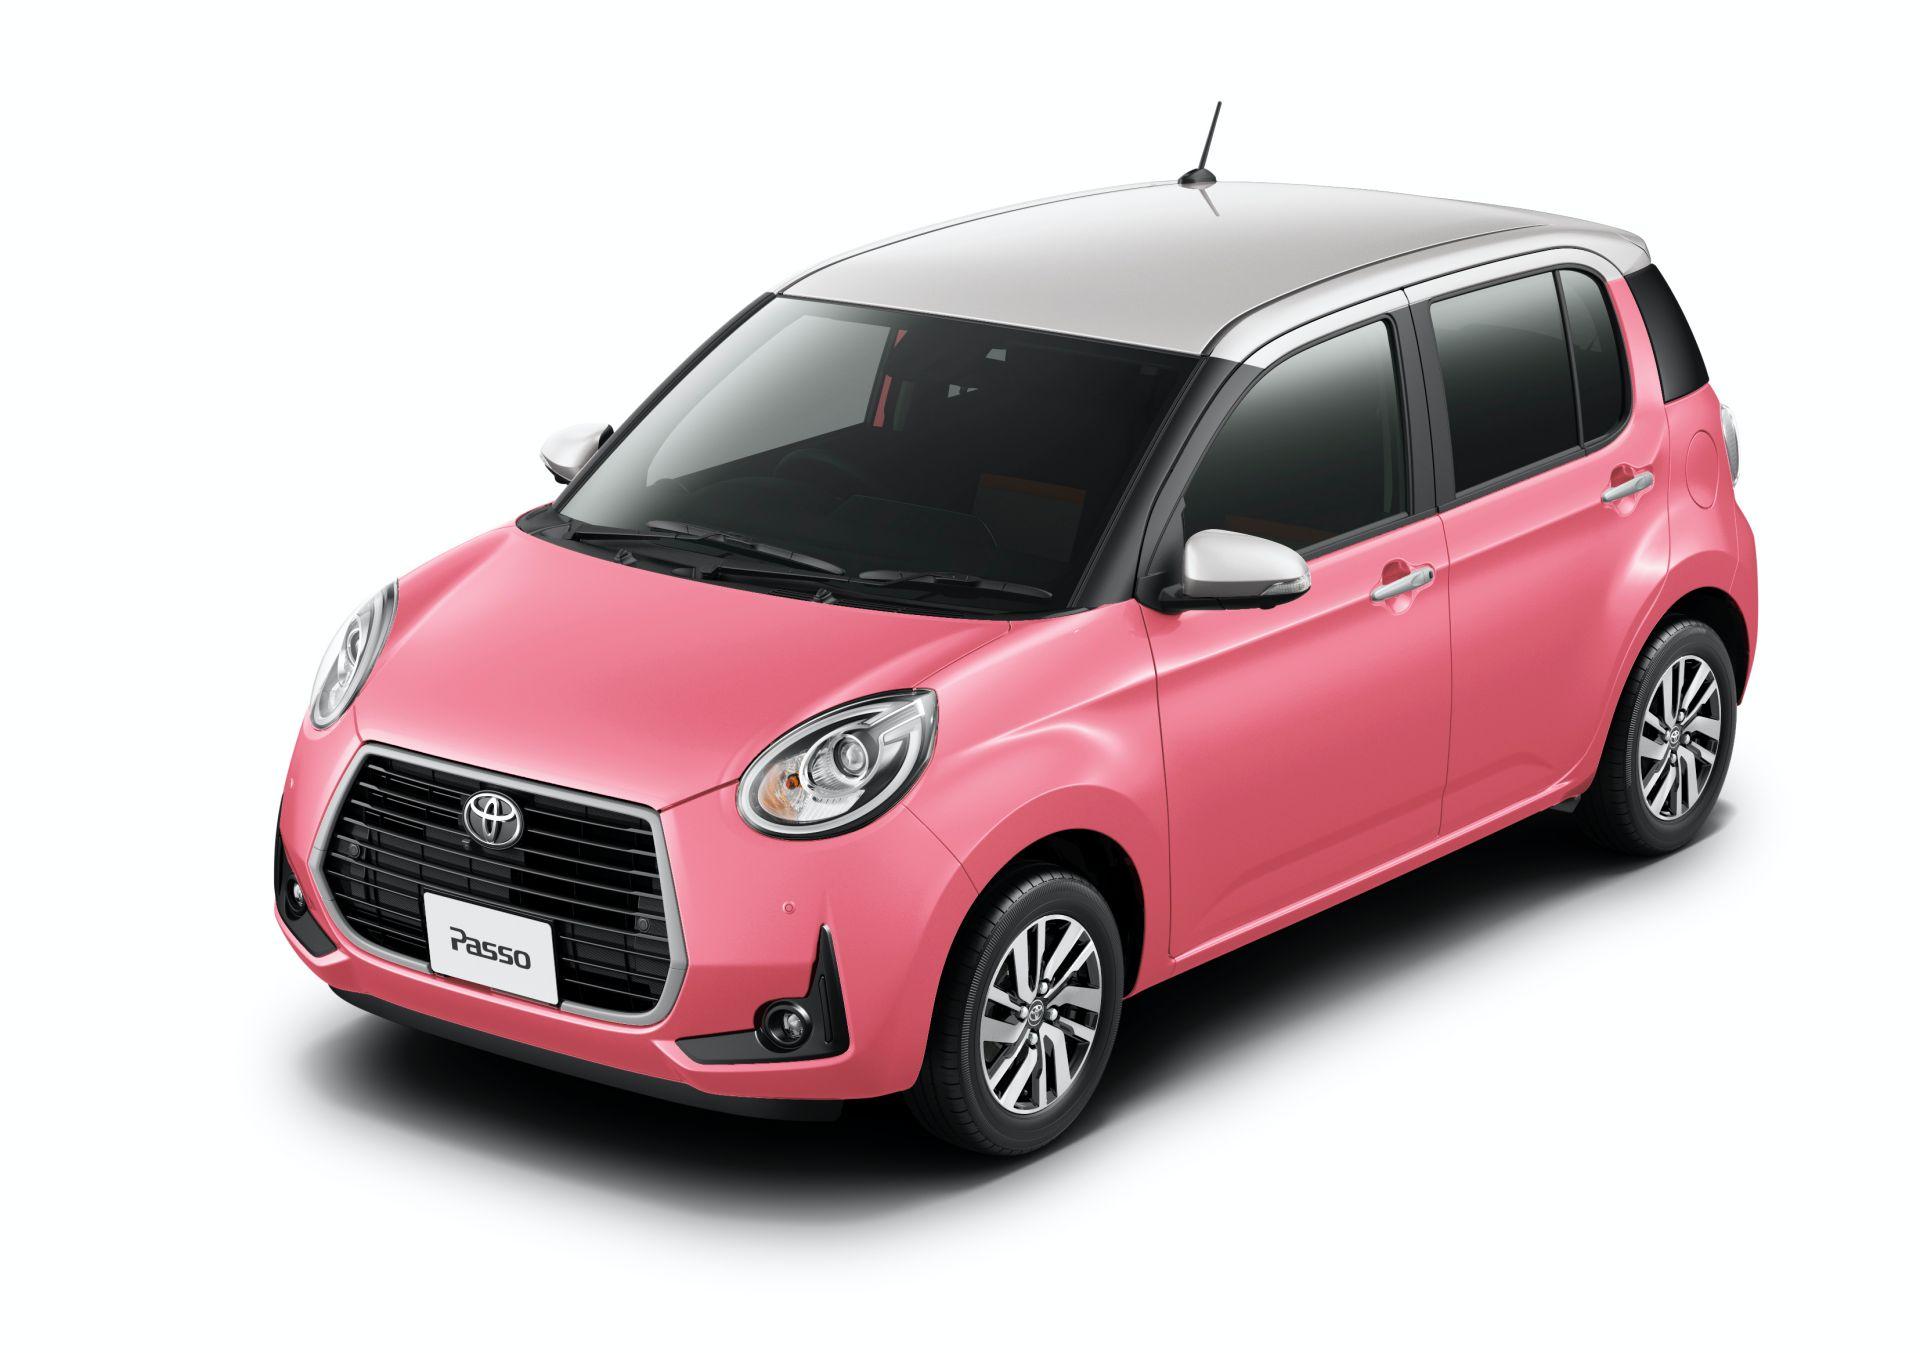 Toyota_Passo_Moda_Charm_0003